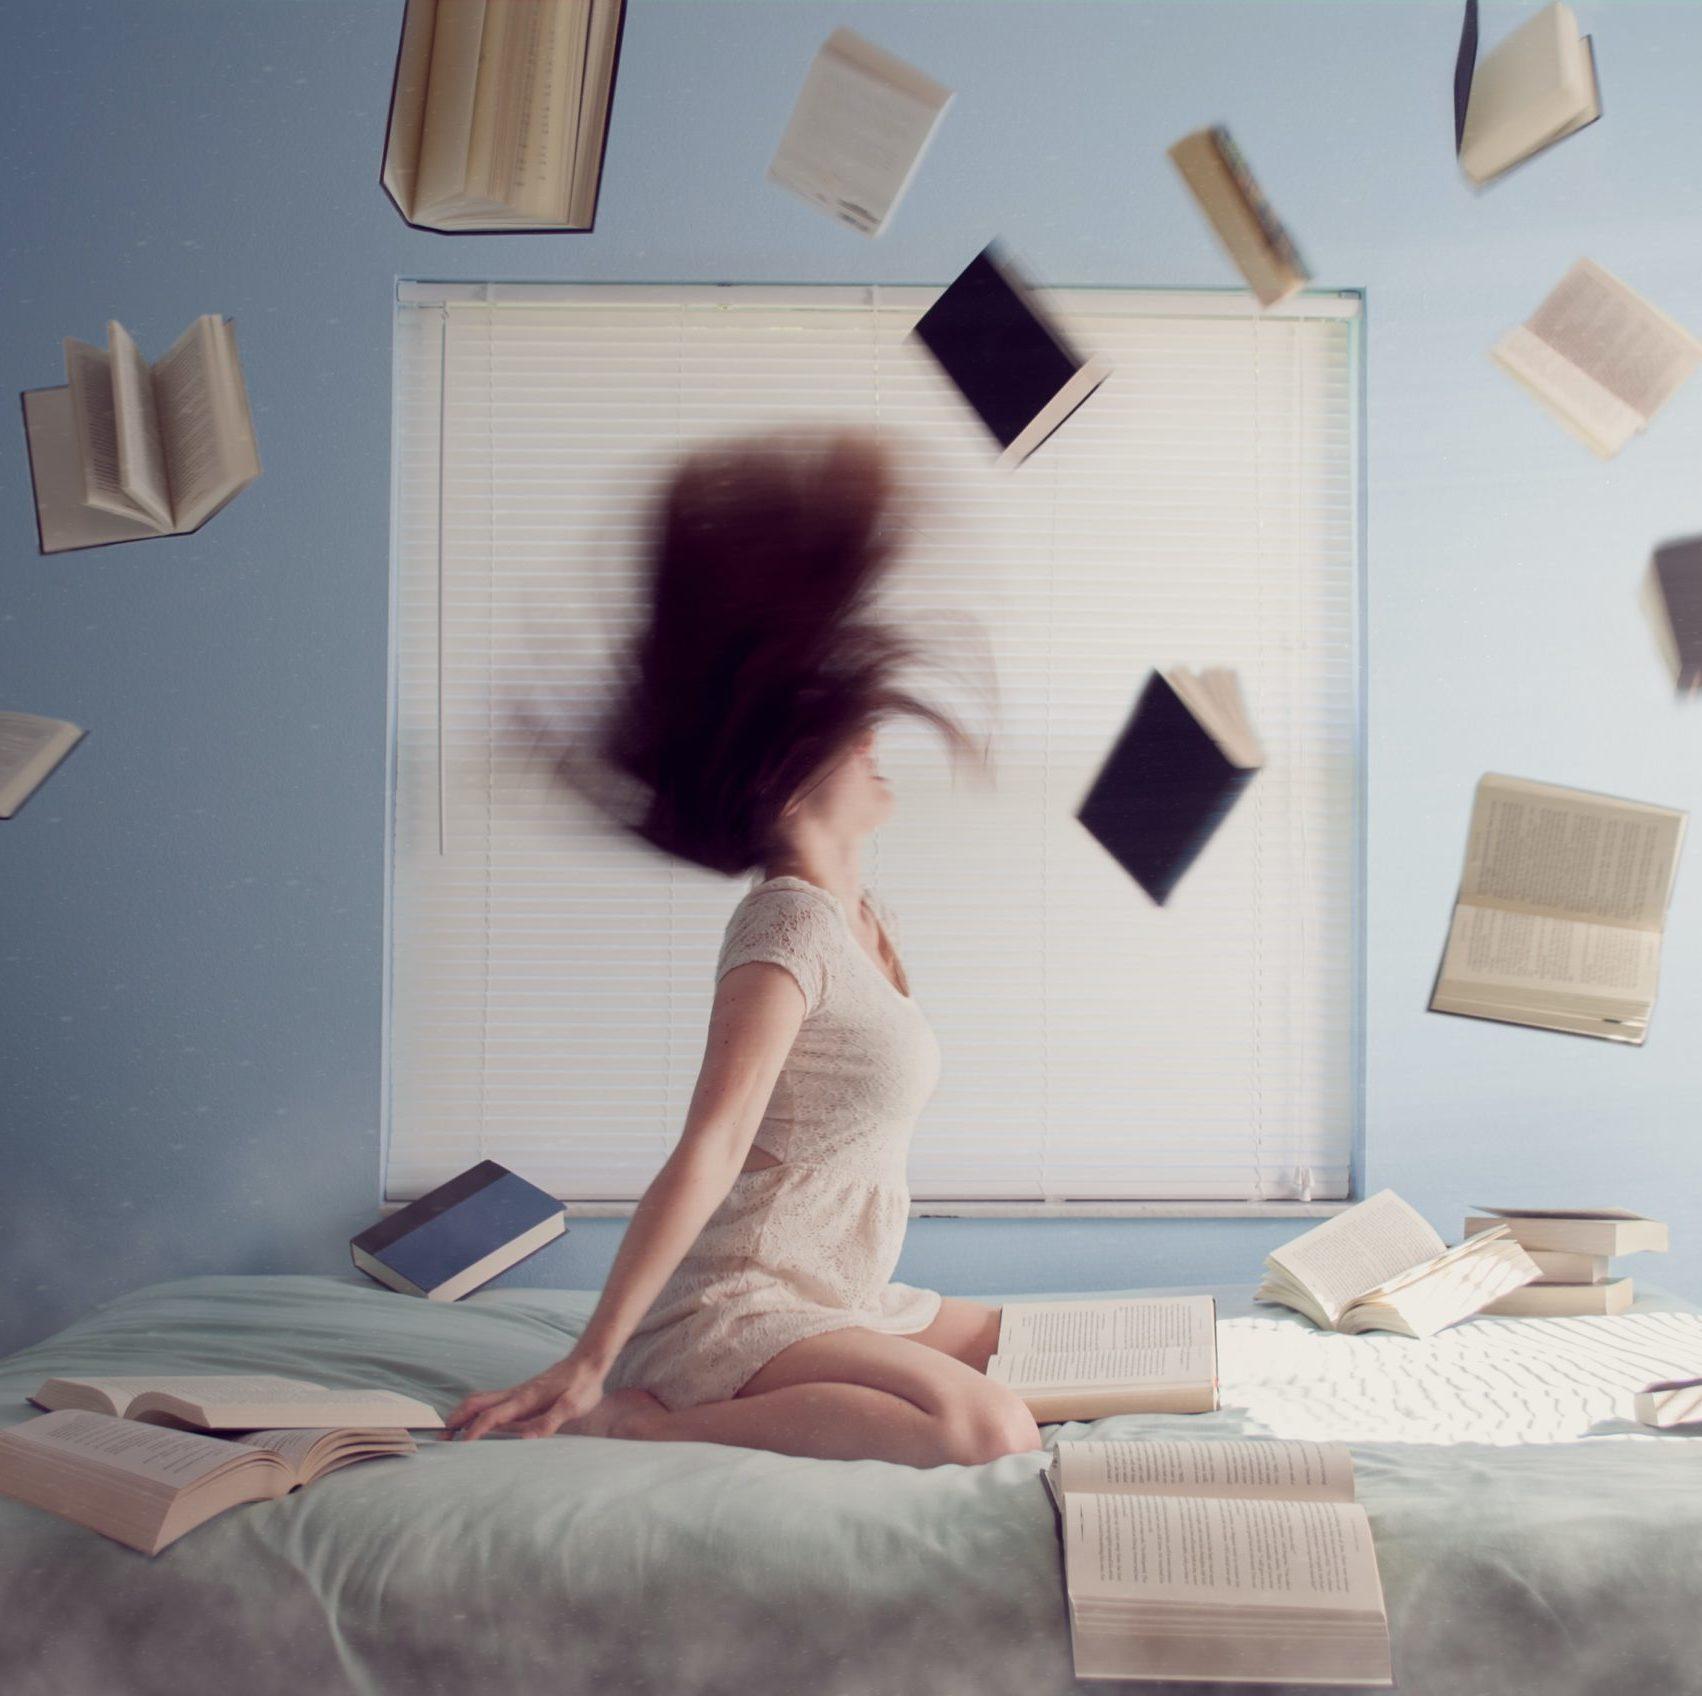 sadness anger books girl